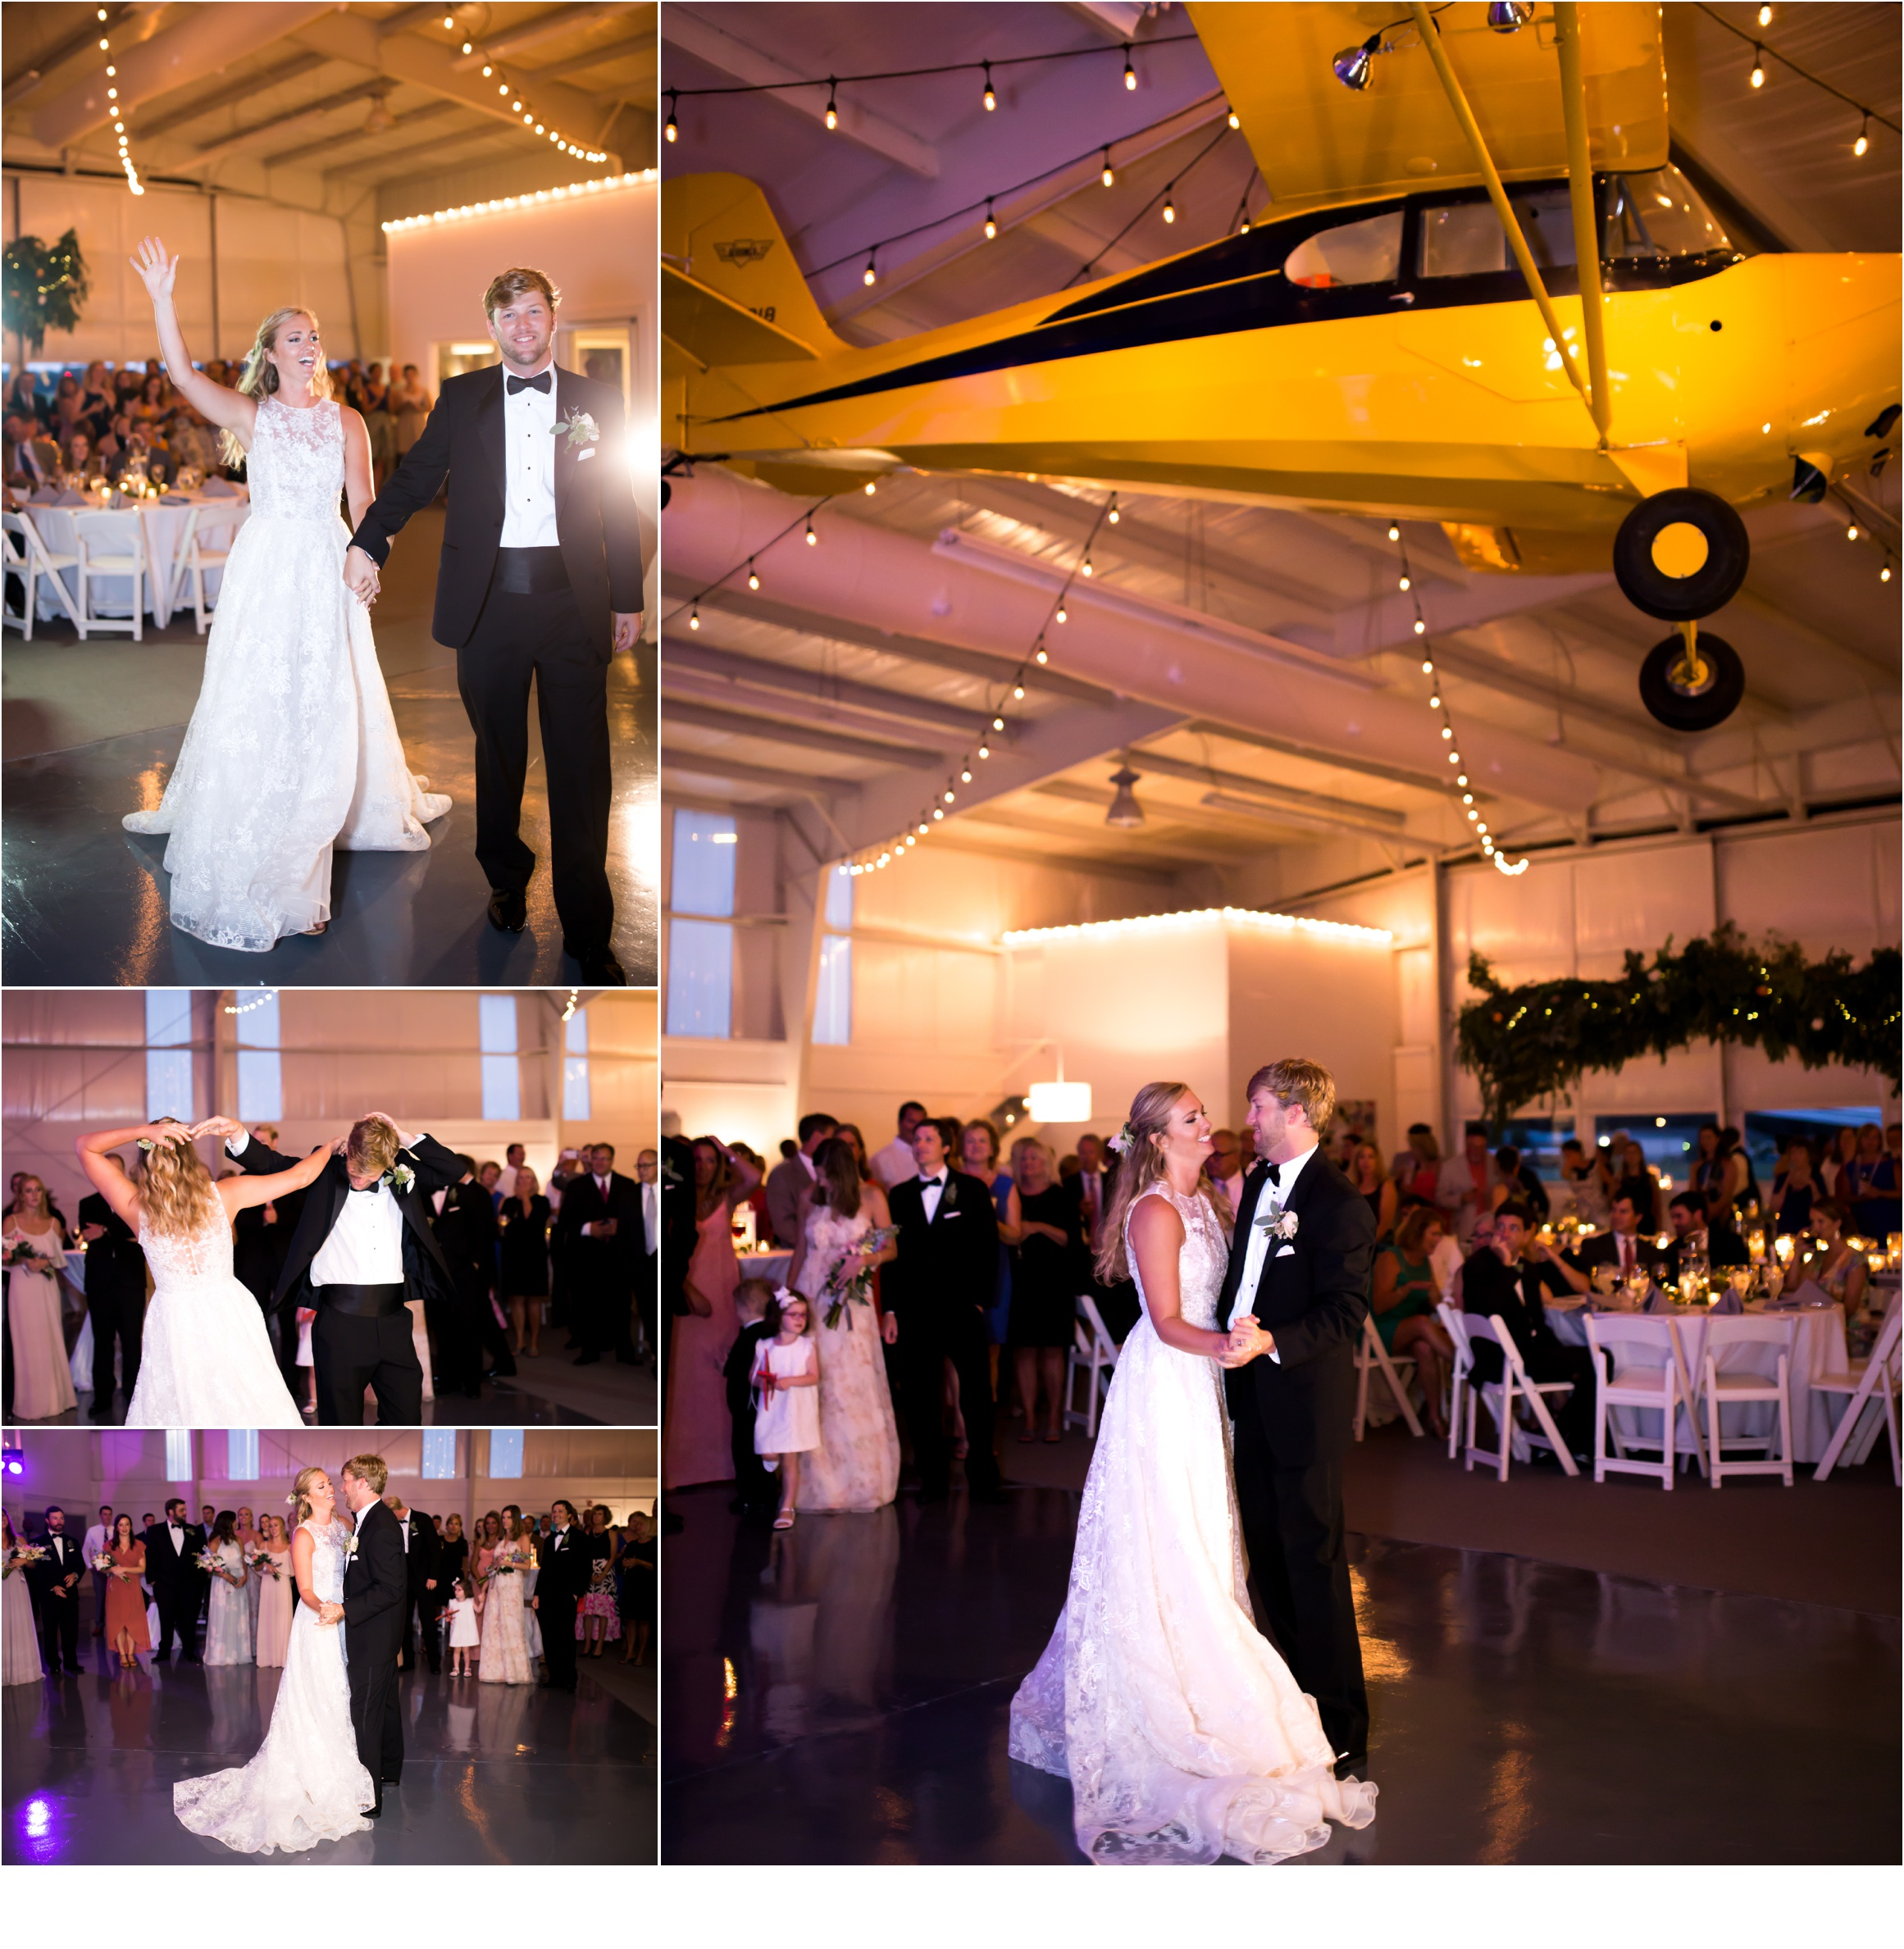 Rainey_Gregg_Photography_St._Simons_Island_Georgia_California_Wedding_Portrait_Photography_0104.jpg